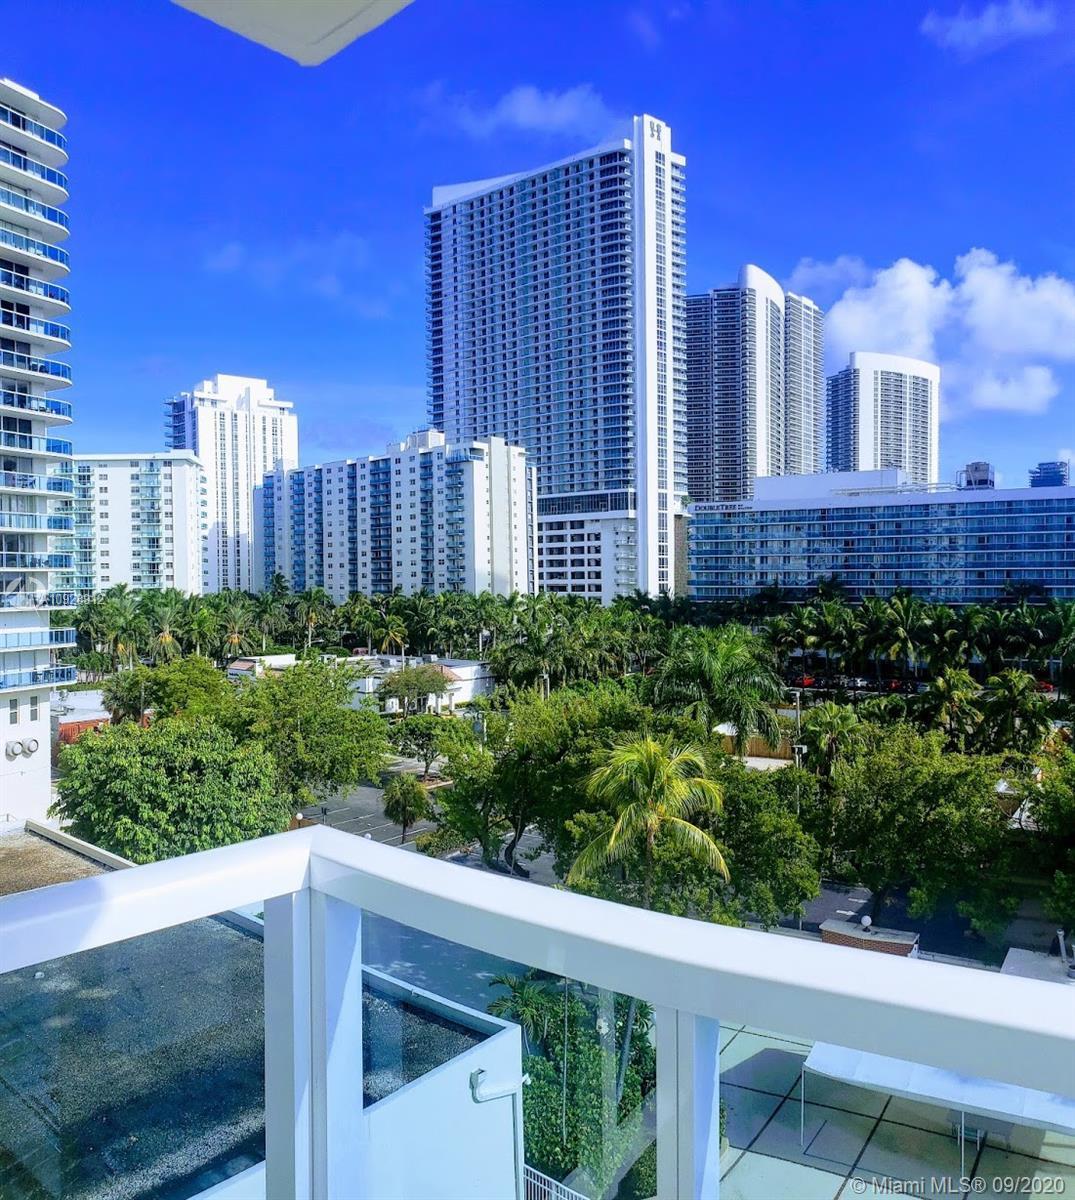 BREATHTAKING VIEWS, BEST line in Hallmark ! 2 bedrooms 2 bath HUGE CORNER unit with beautiful views